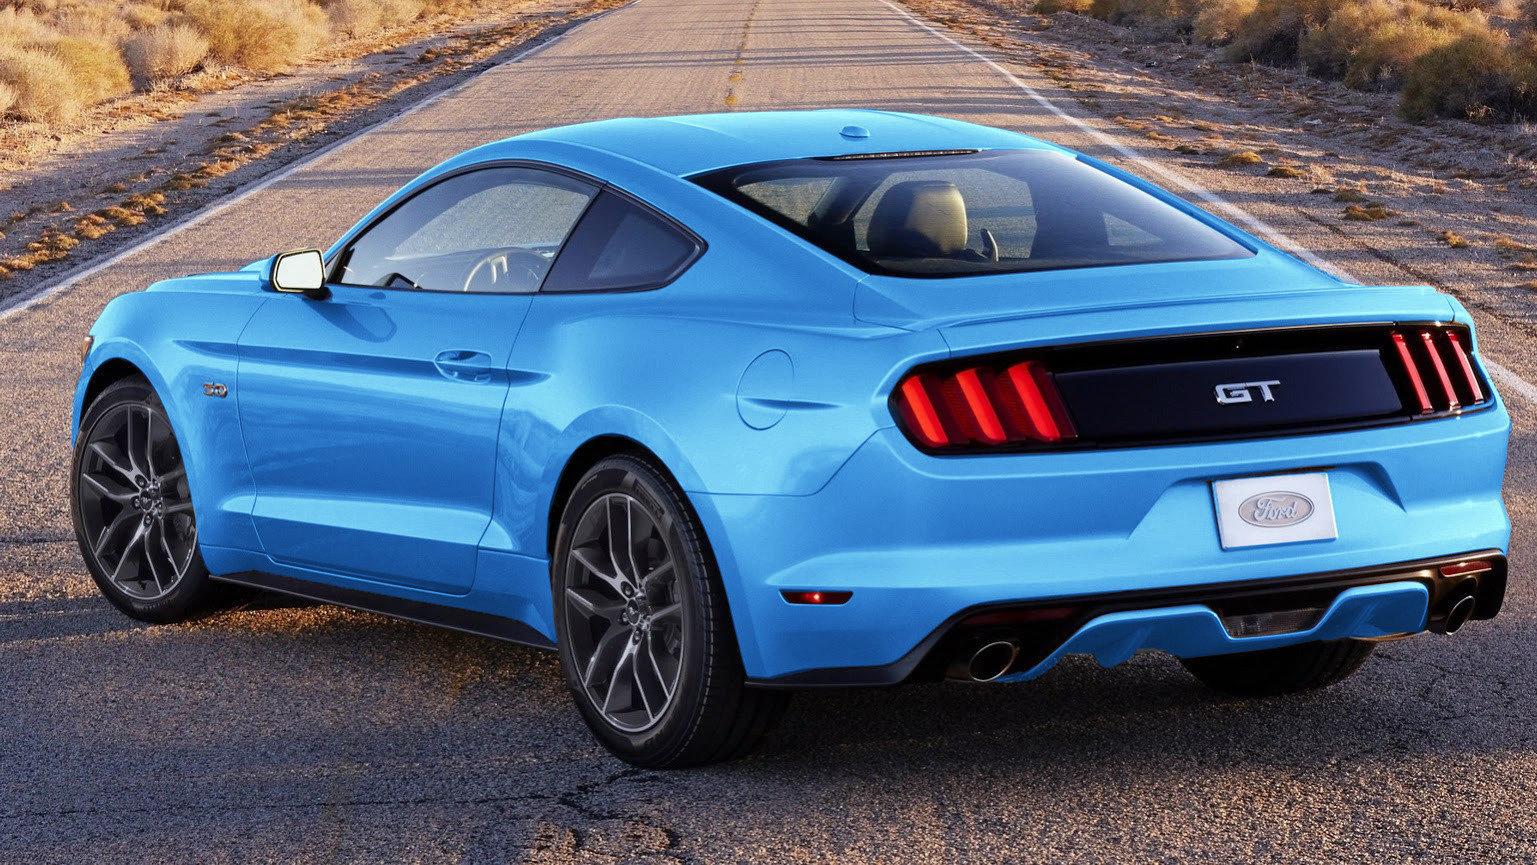 Grabber Blue Mustang >> Petition · Bring back the color Grabber Blue for the 2015 ...